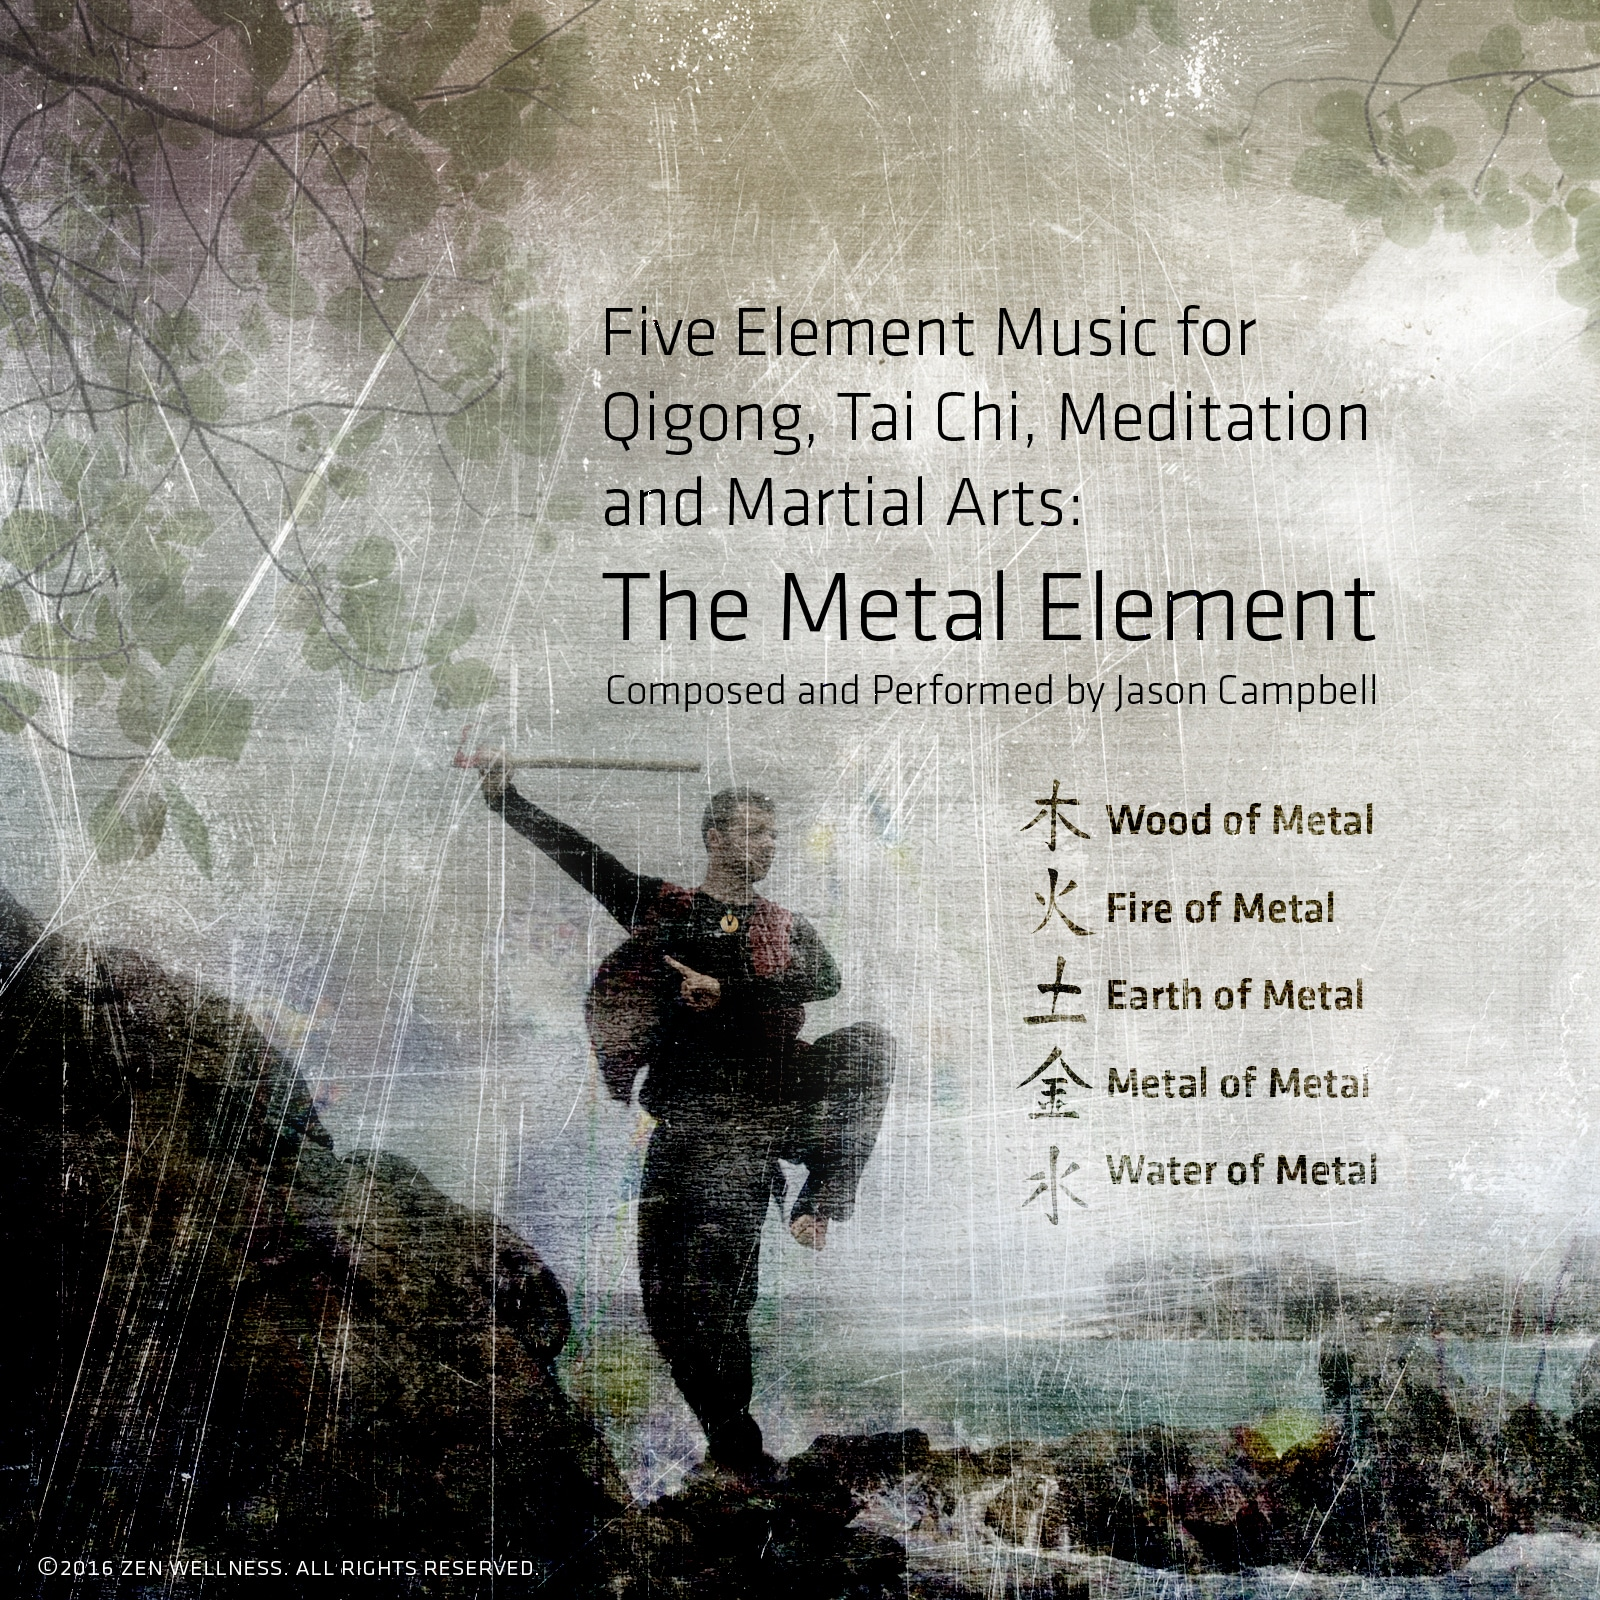 Jason Campbel - 5 Element Music: The Metal Element